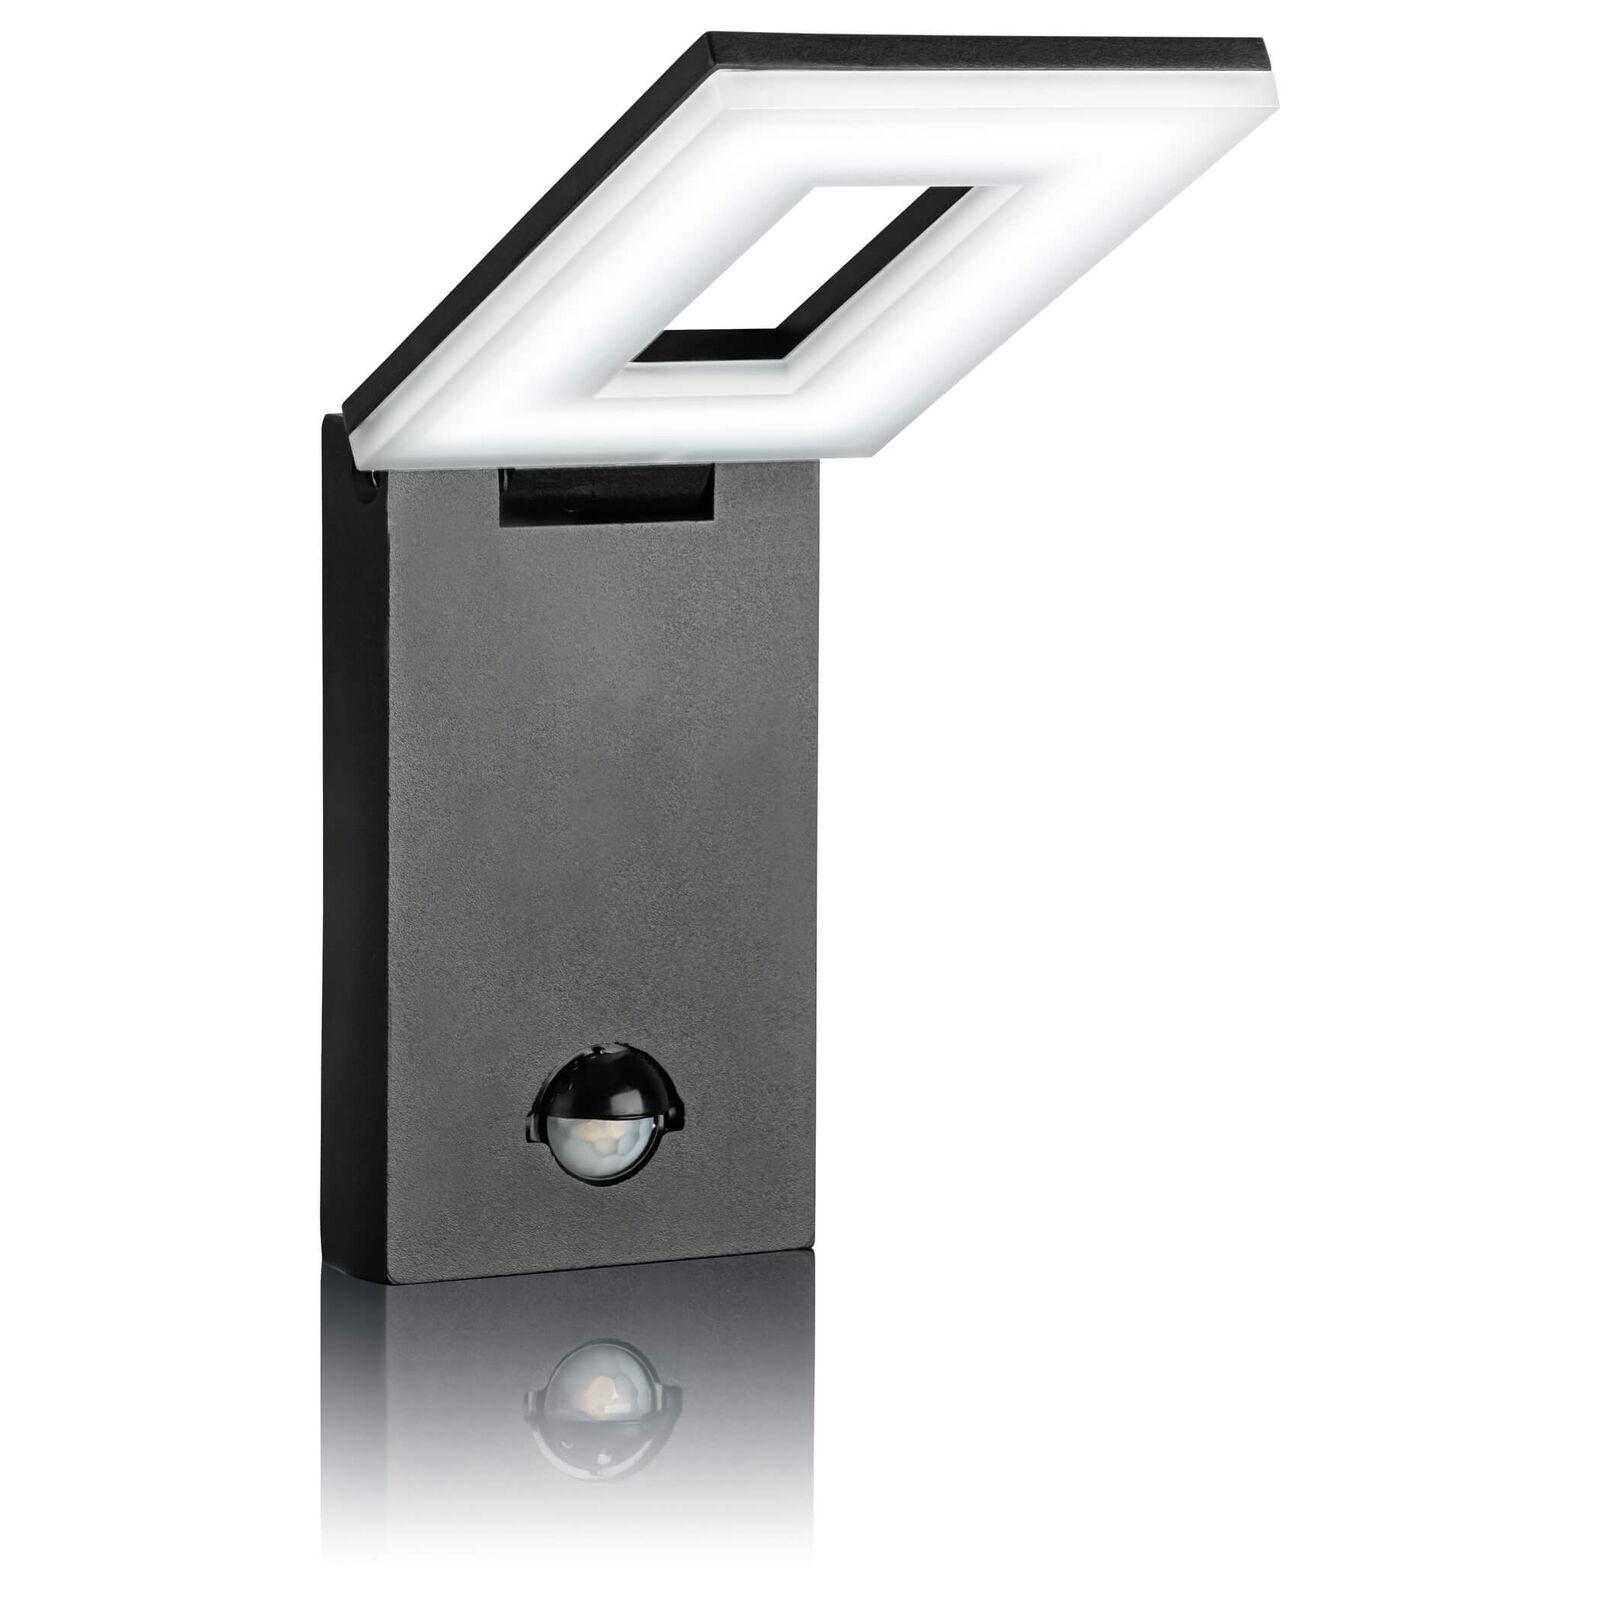 LED Aussenleuchte mit Bewegungsmelder, Wandleuchte schwarz, Aluminium SEBSON